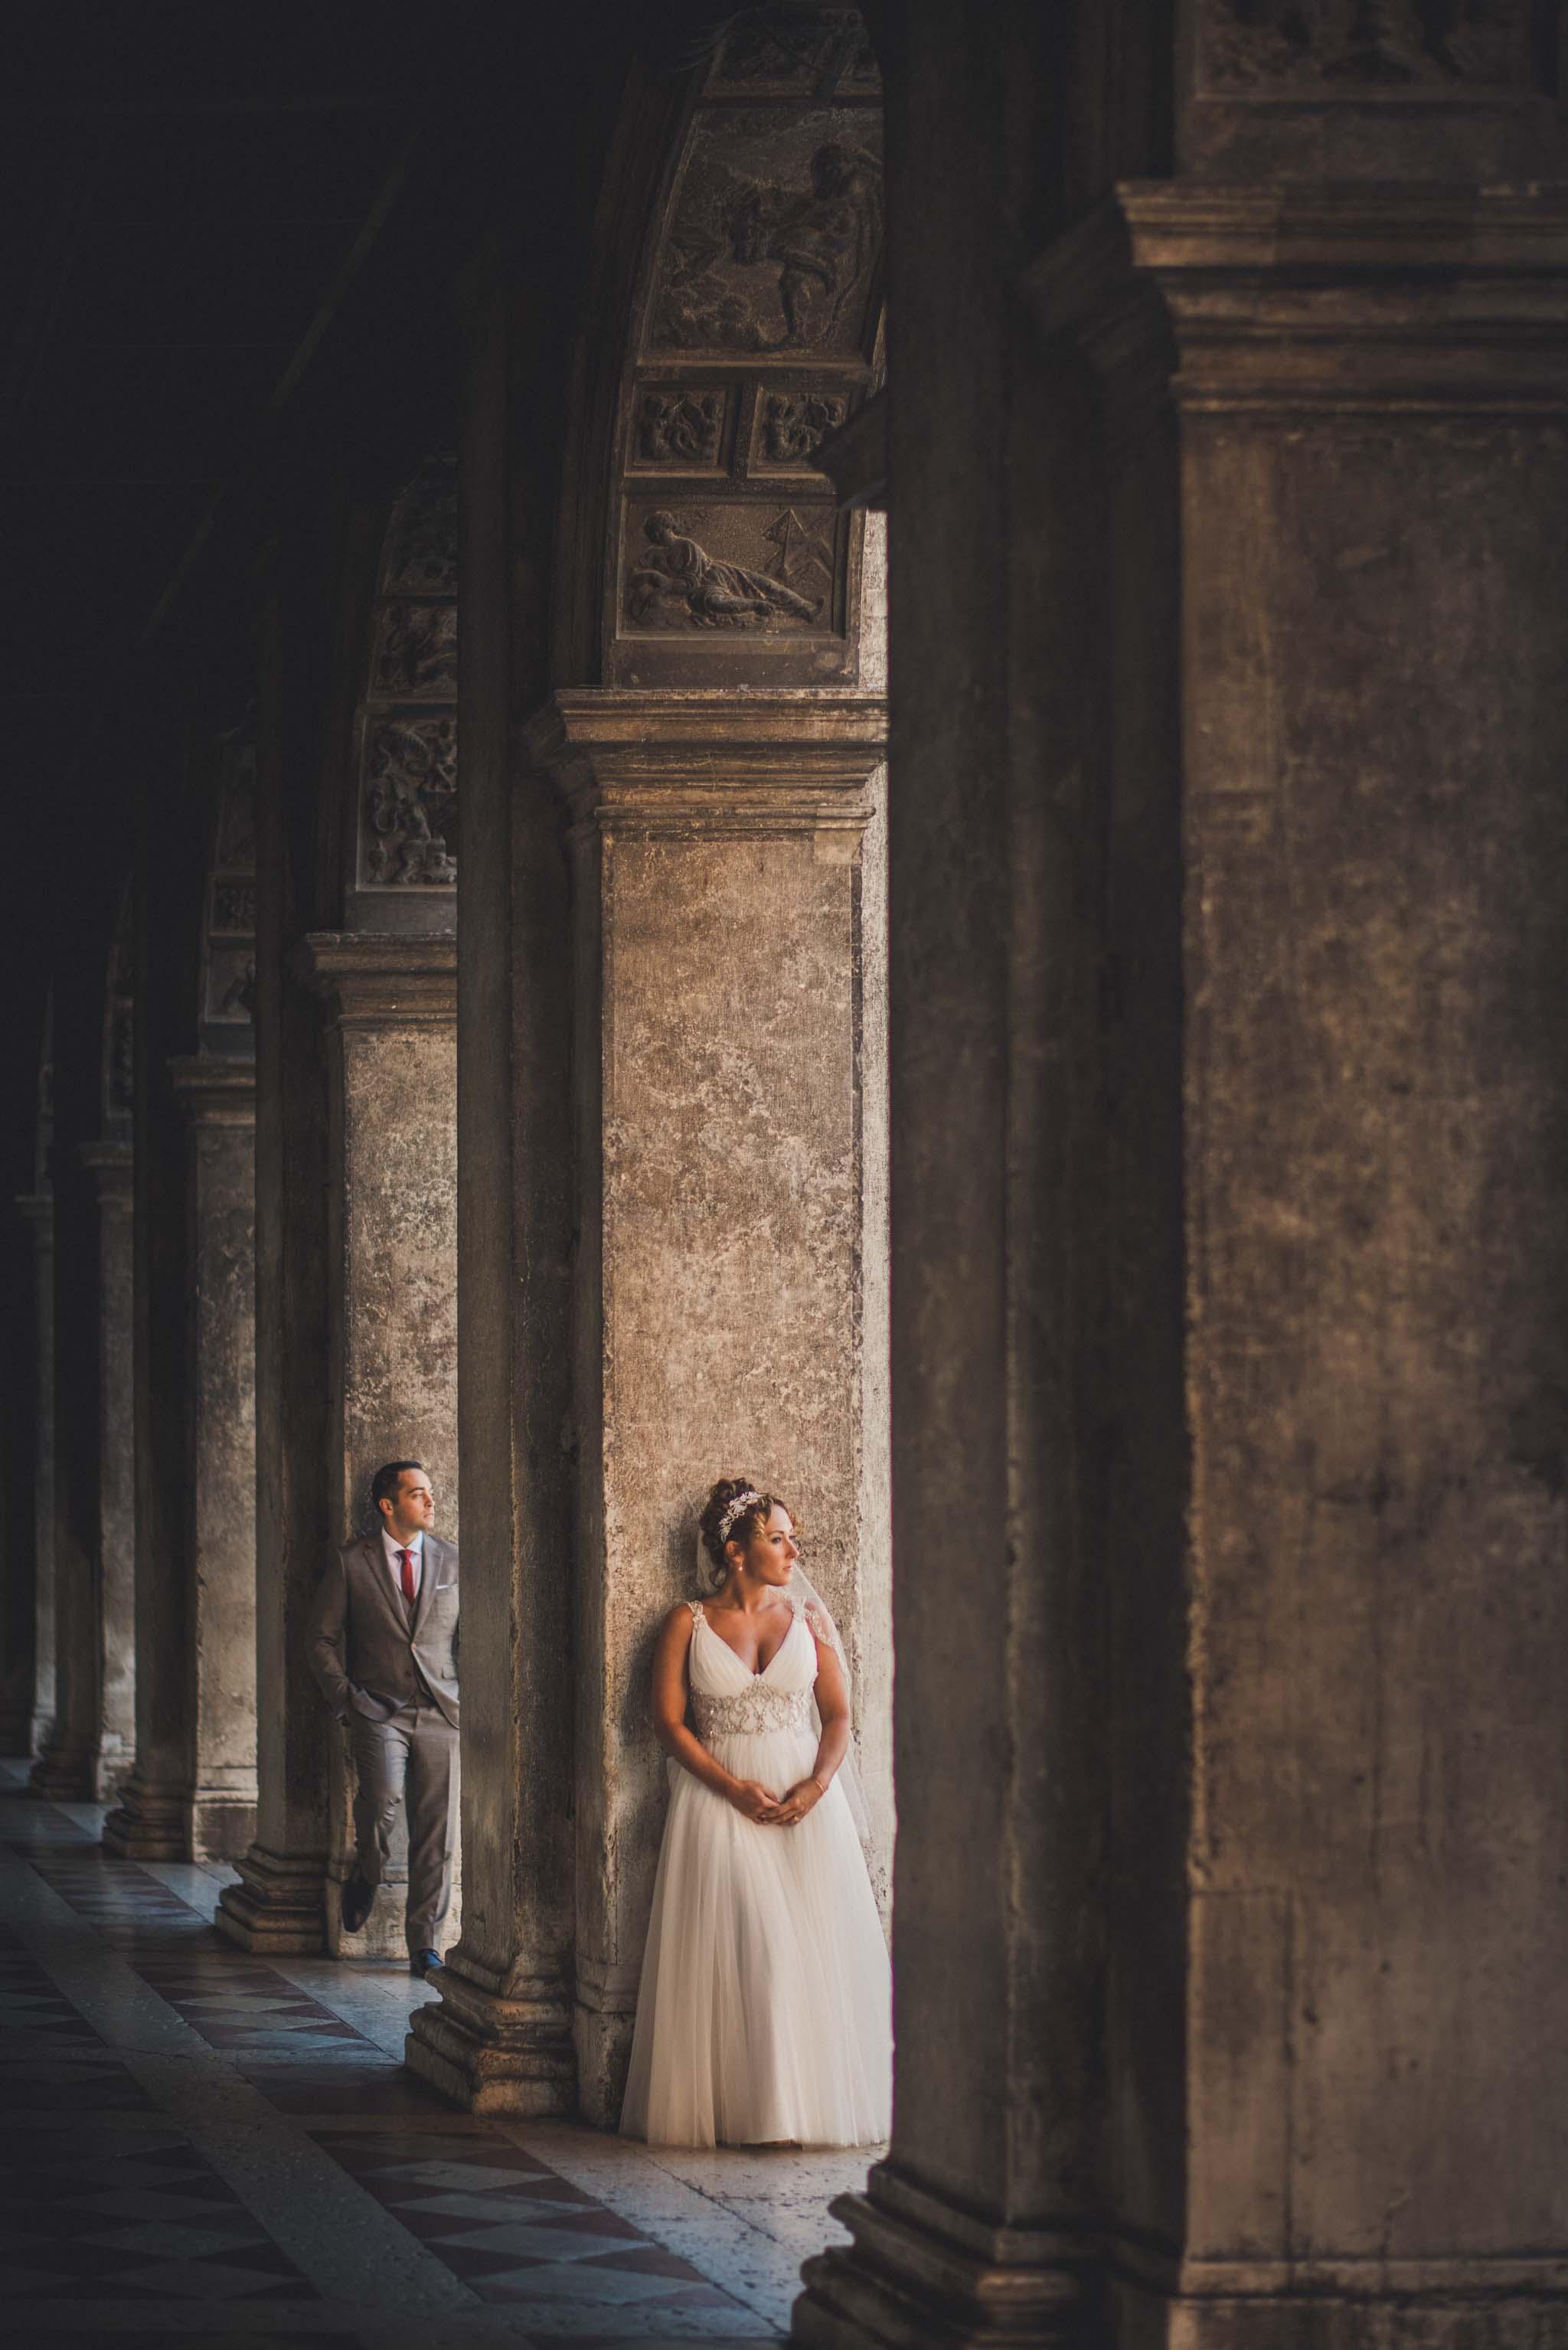 wedding-in-venice-roberto-panciatici-photography-21